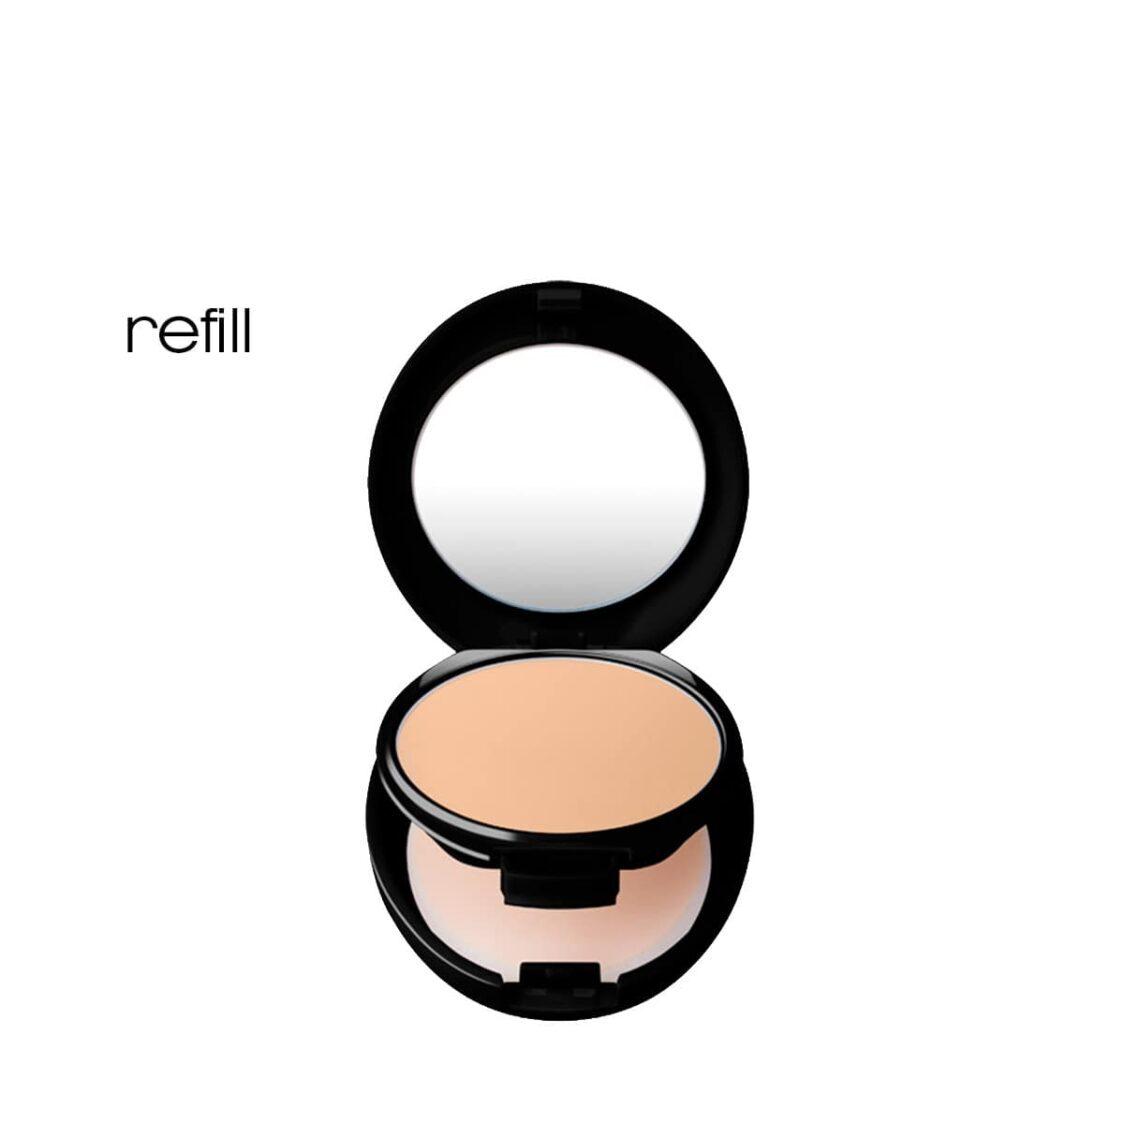 Shu Uemura The Lightbulb UV Compact Refill